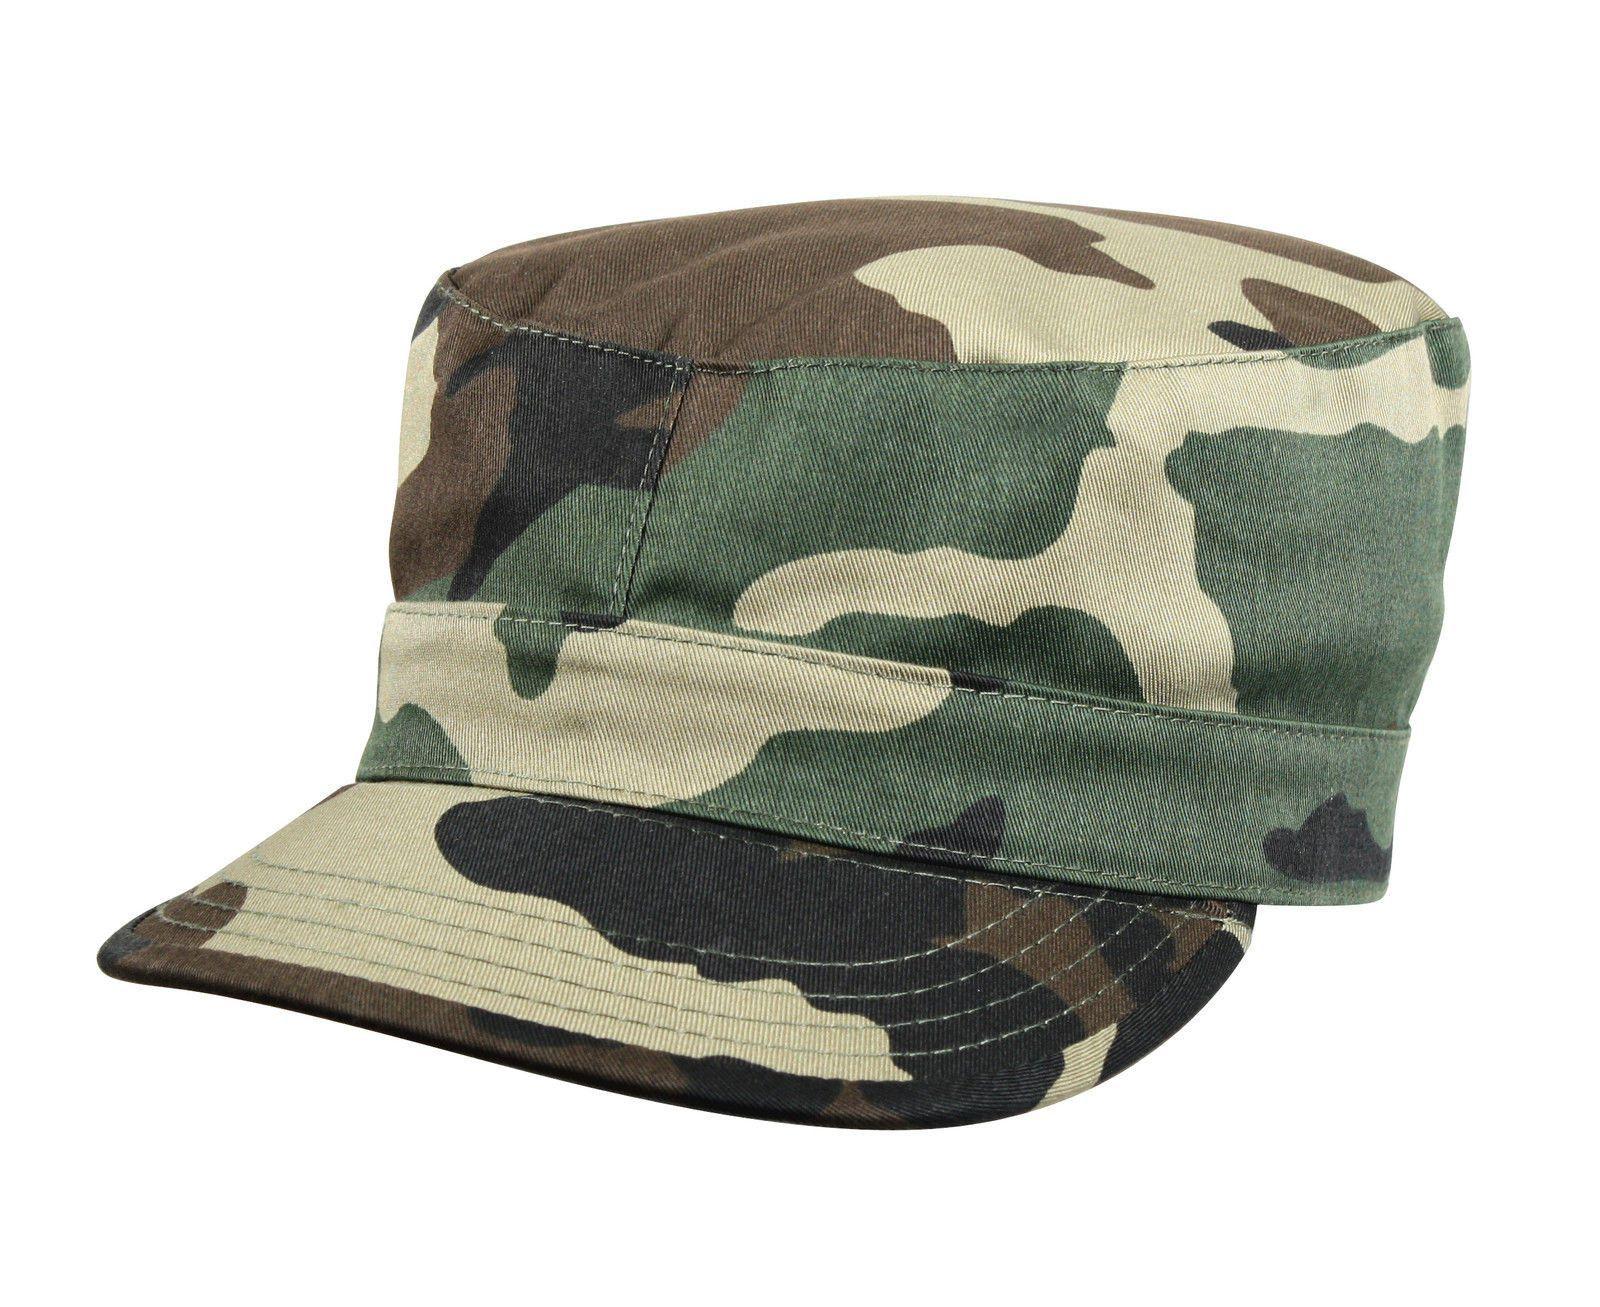 cb697ea56 Men's Military Style Caps - Camo Rip-Stop Cotton Fatigue Cap Fitted ...